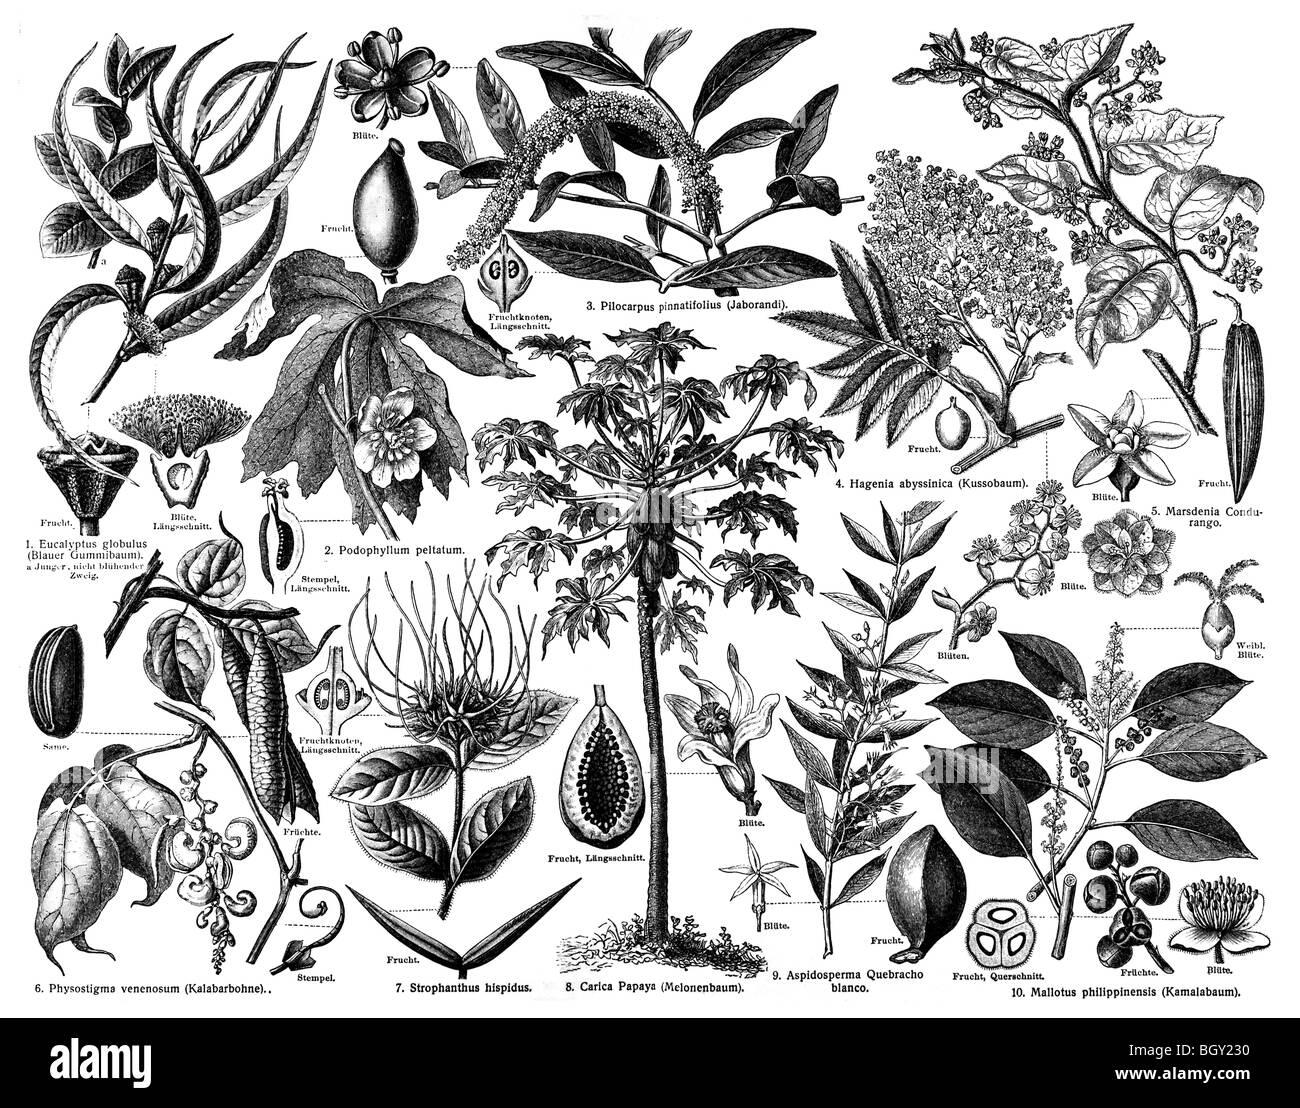 Medicinal Plants C - Stock Image